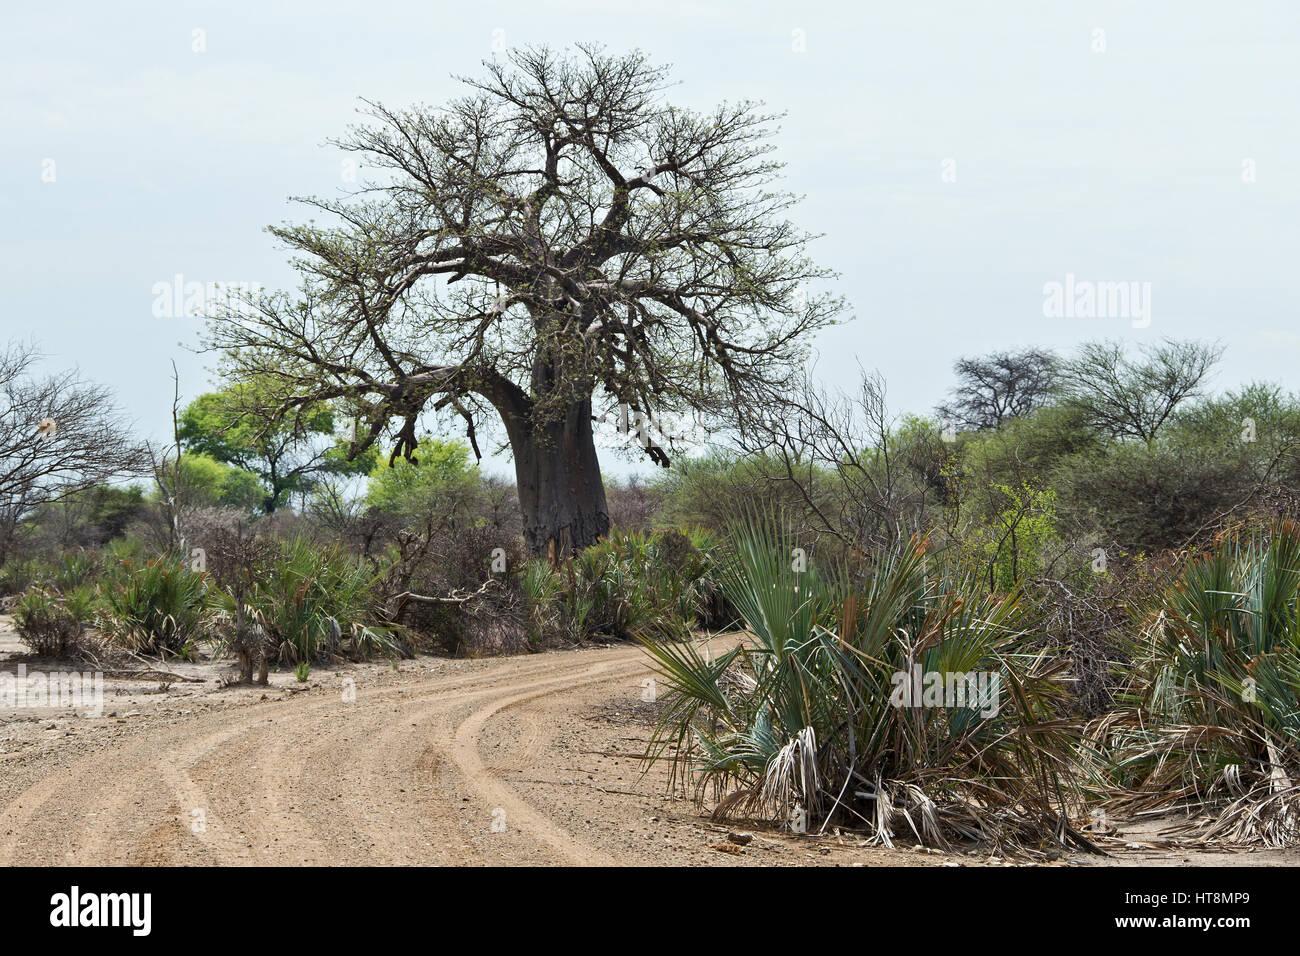 A Baobab tree in Mahango on Caprivi - Stock Image